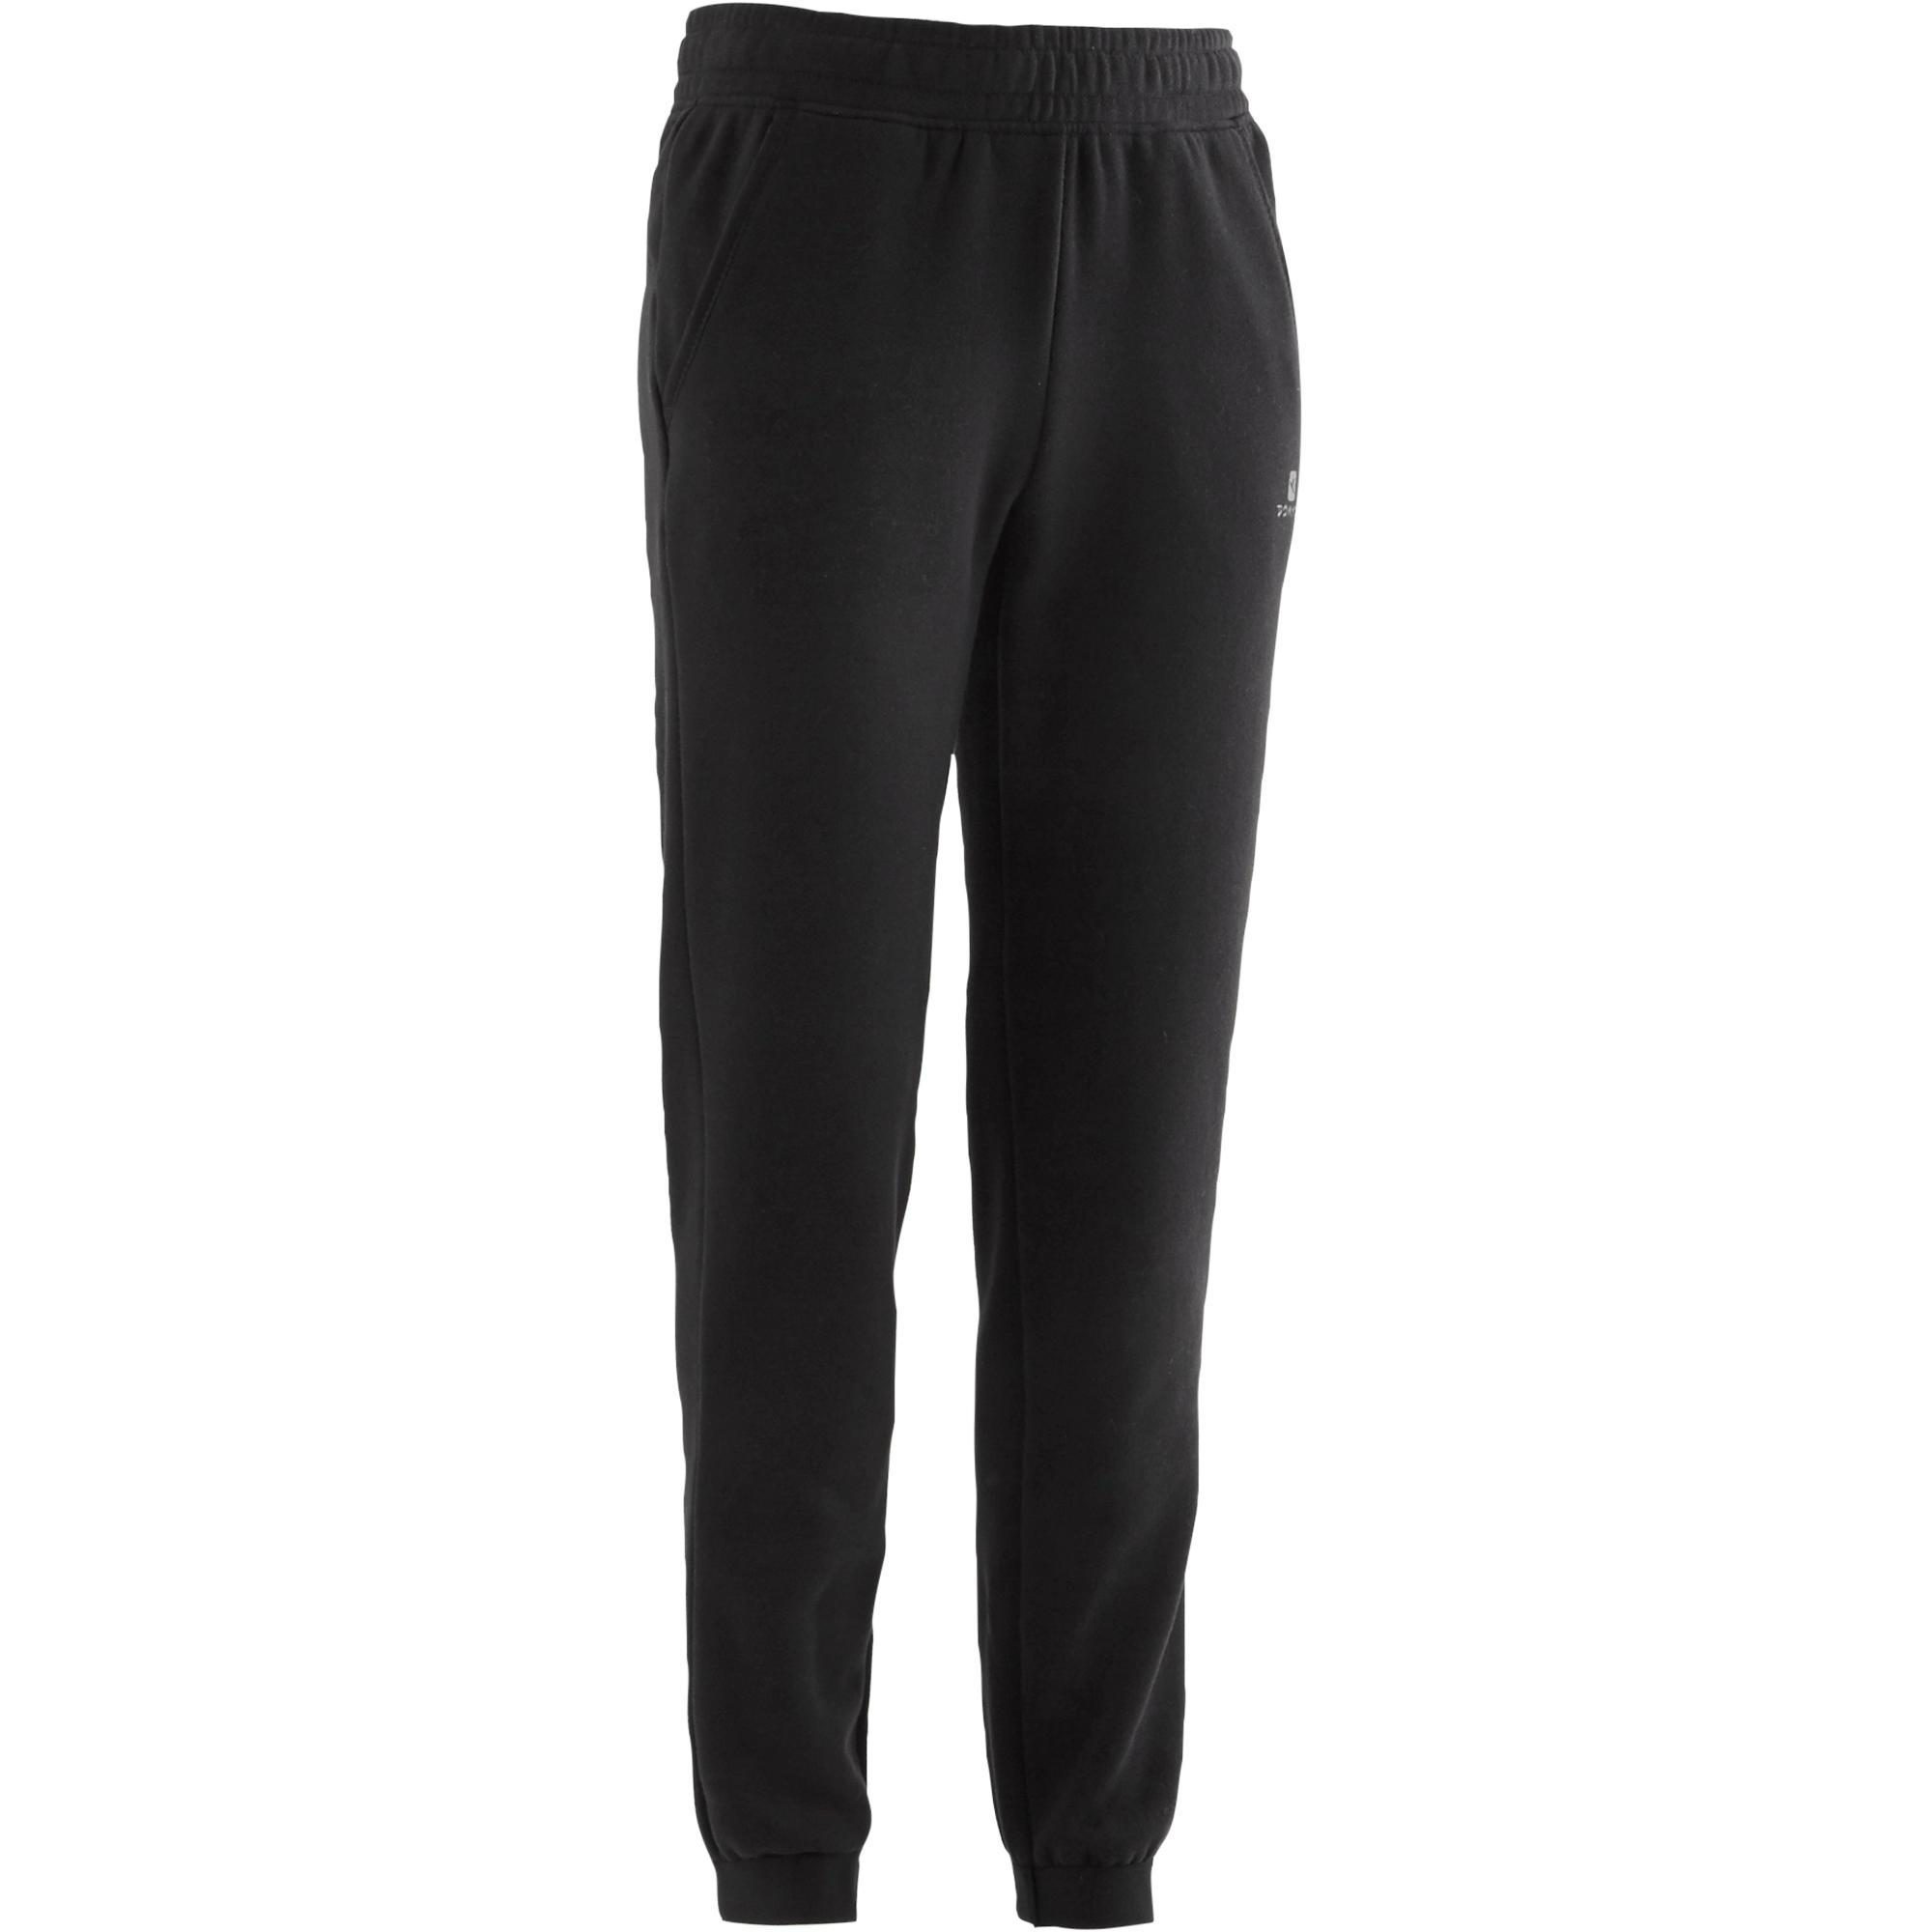 Pantalon molleton 500 Gym garçon noir